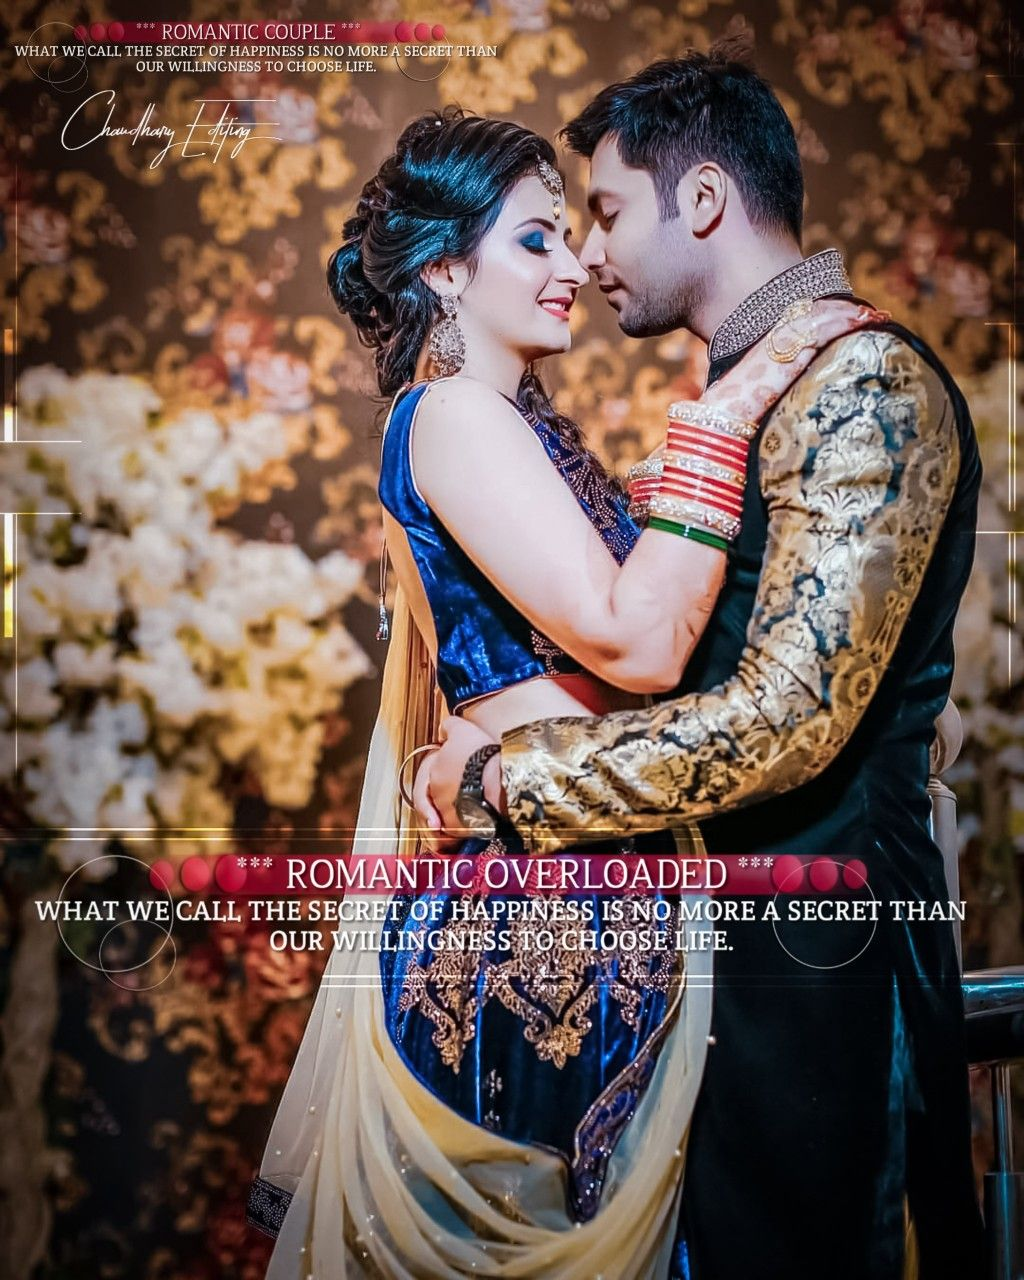 Cute Couple Hd Dp Chaudhary Inc In 2020 Wedding Couples Cute Couples Couples